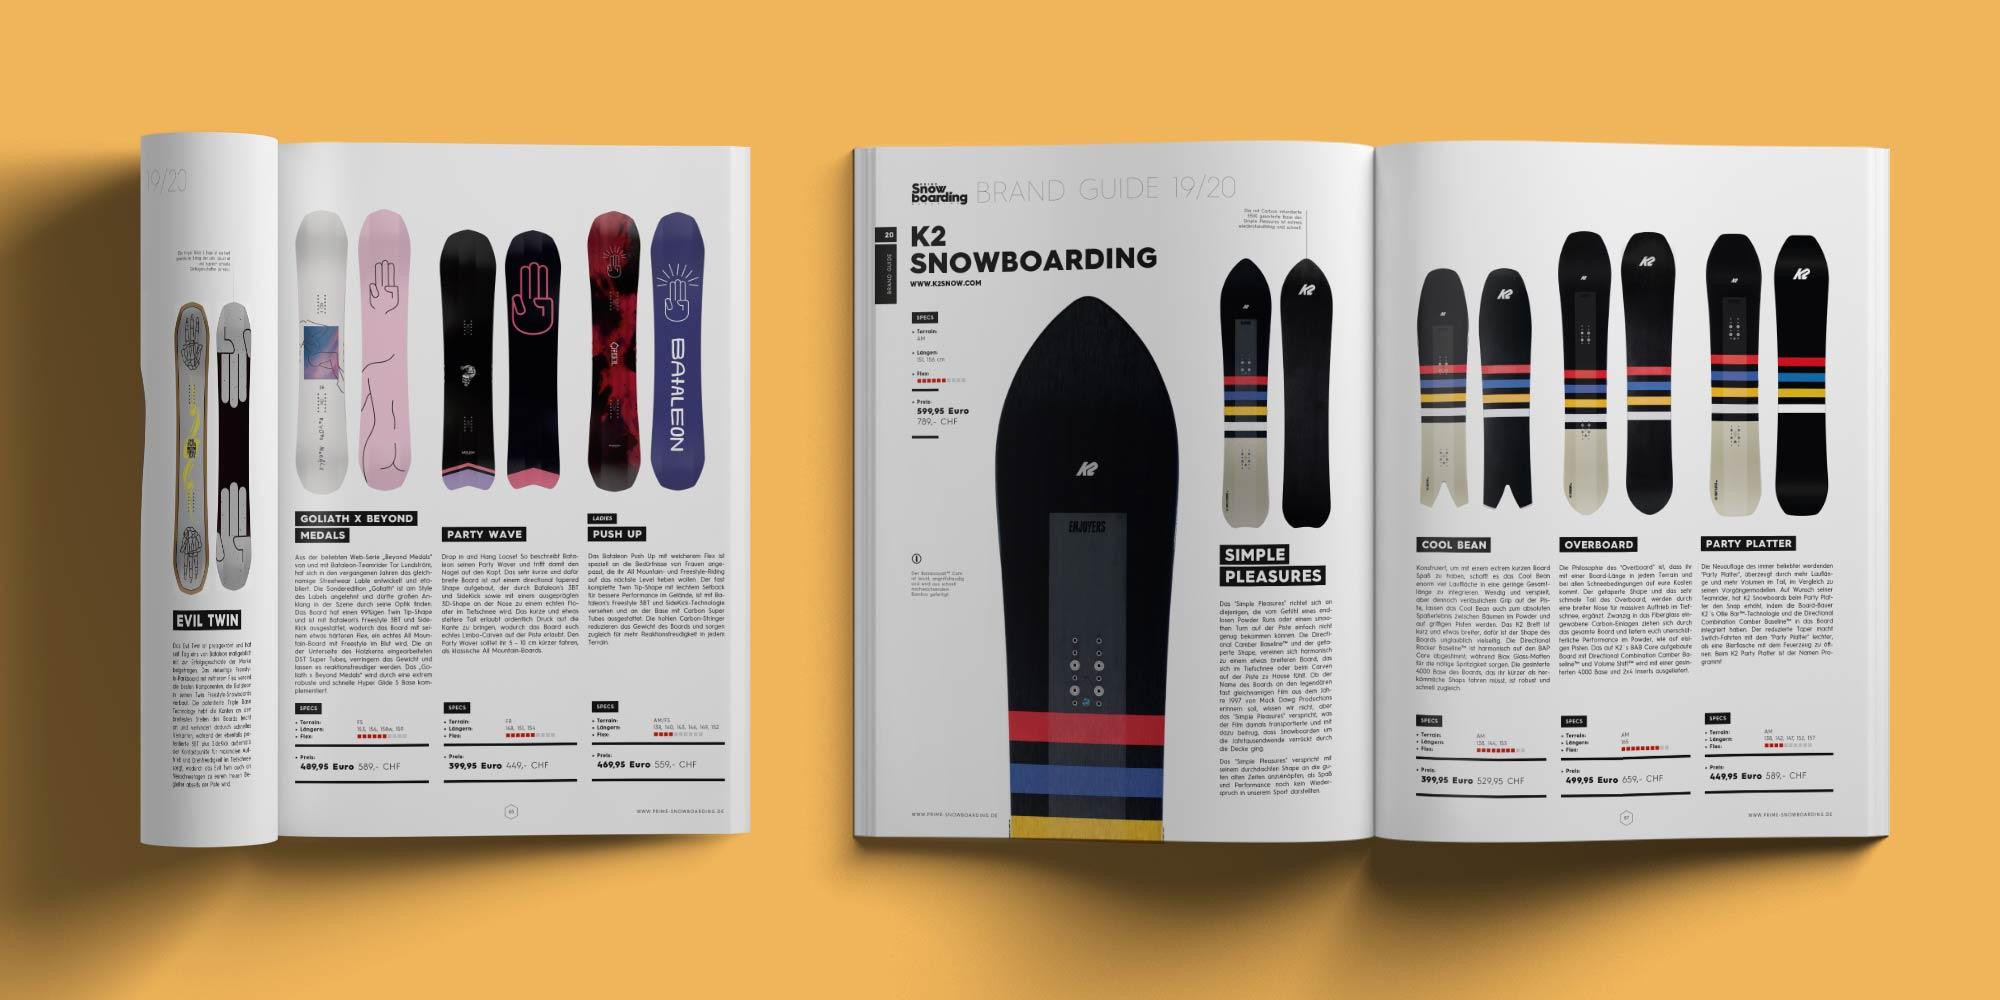 PRIME Snowboarding Printausgabe 20 - Brandguide